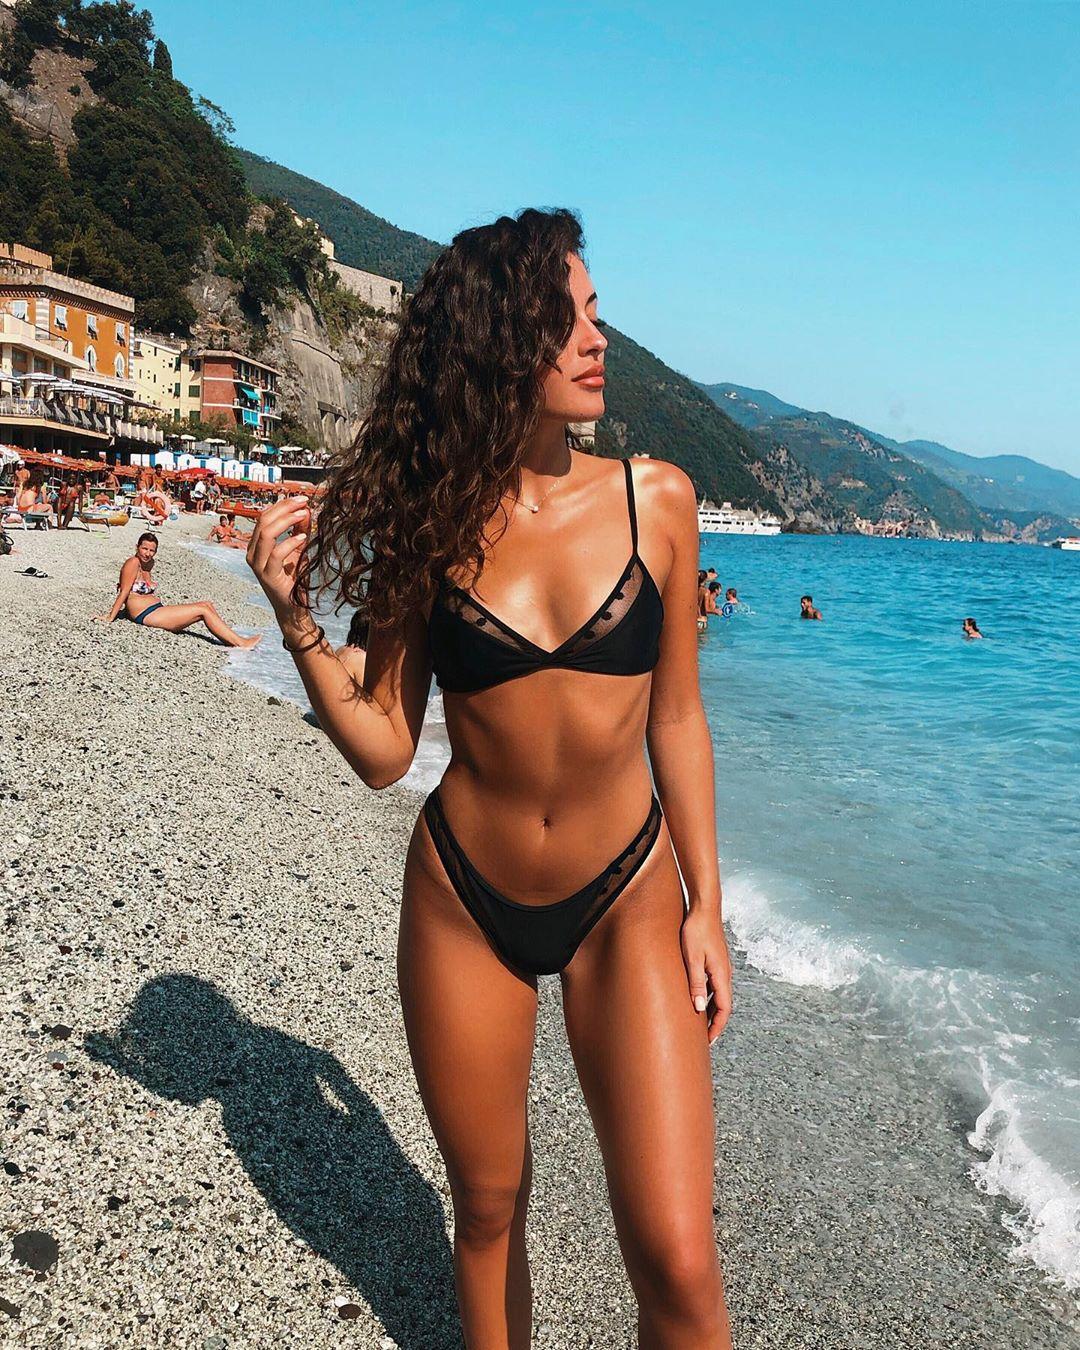 Swimwear Women Sexy Black Mesh Bikini 2020 Female Swimsuit Push Up Biquini Bathing Suit Thong Brazilian Bikinis Set Swim Wear 2